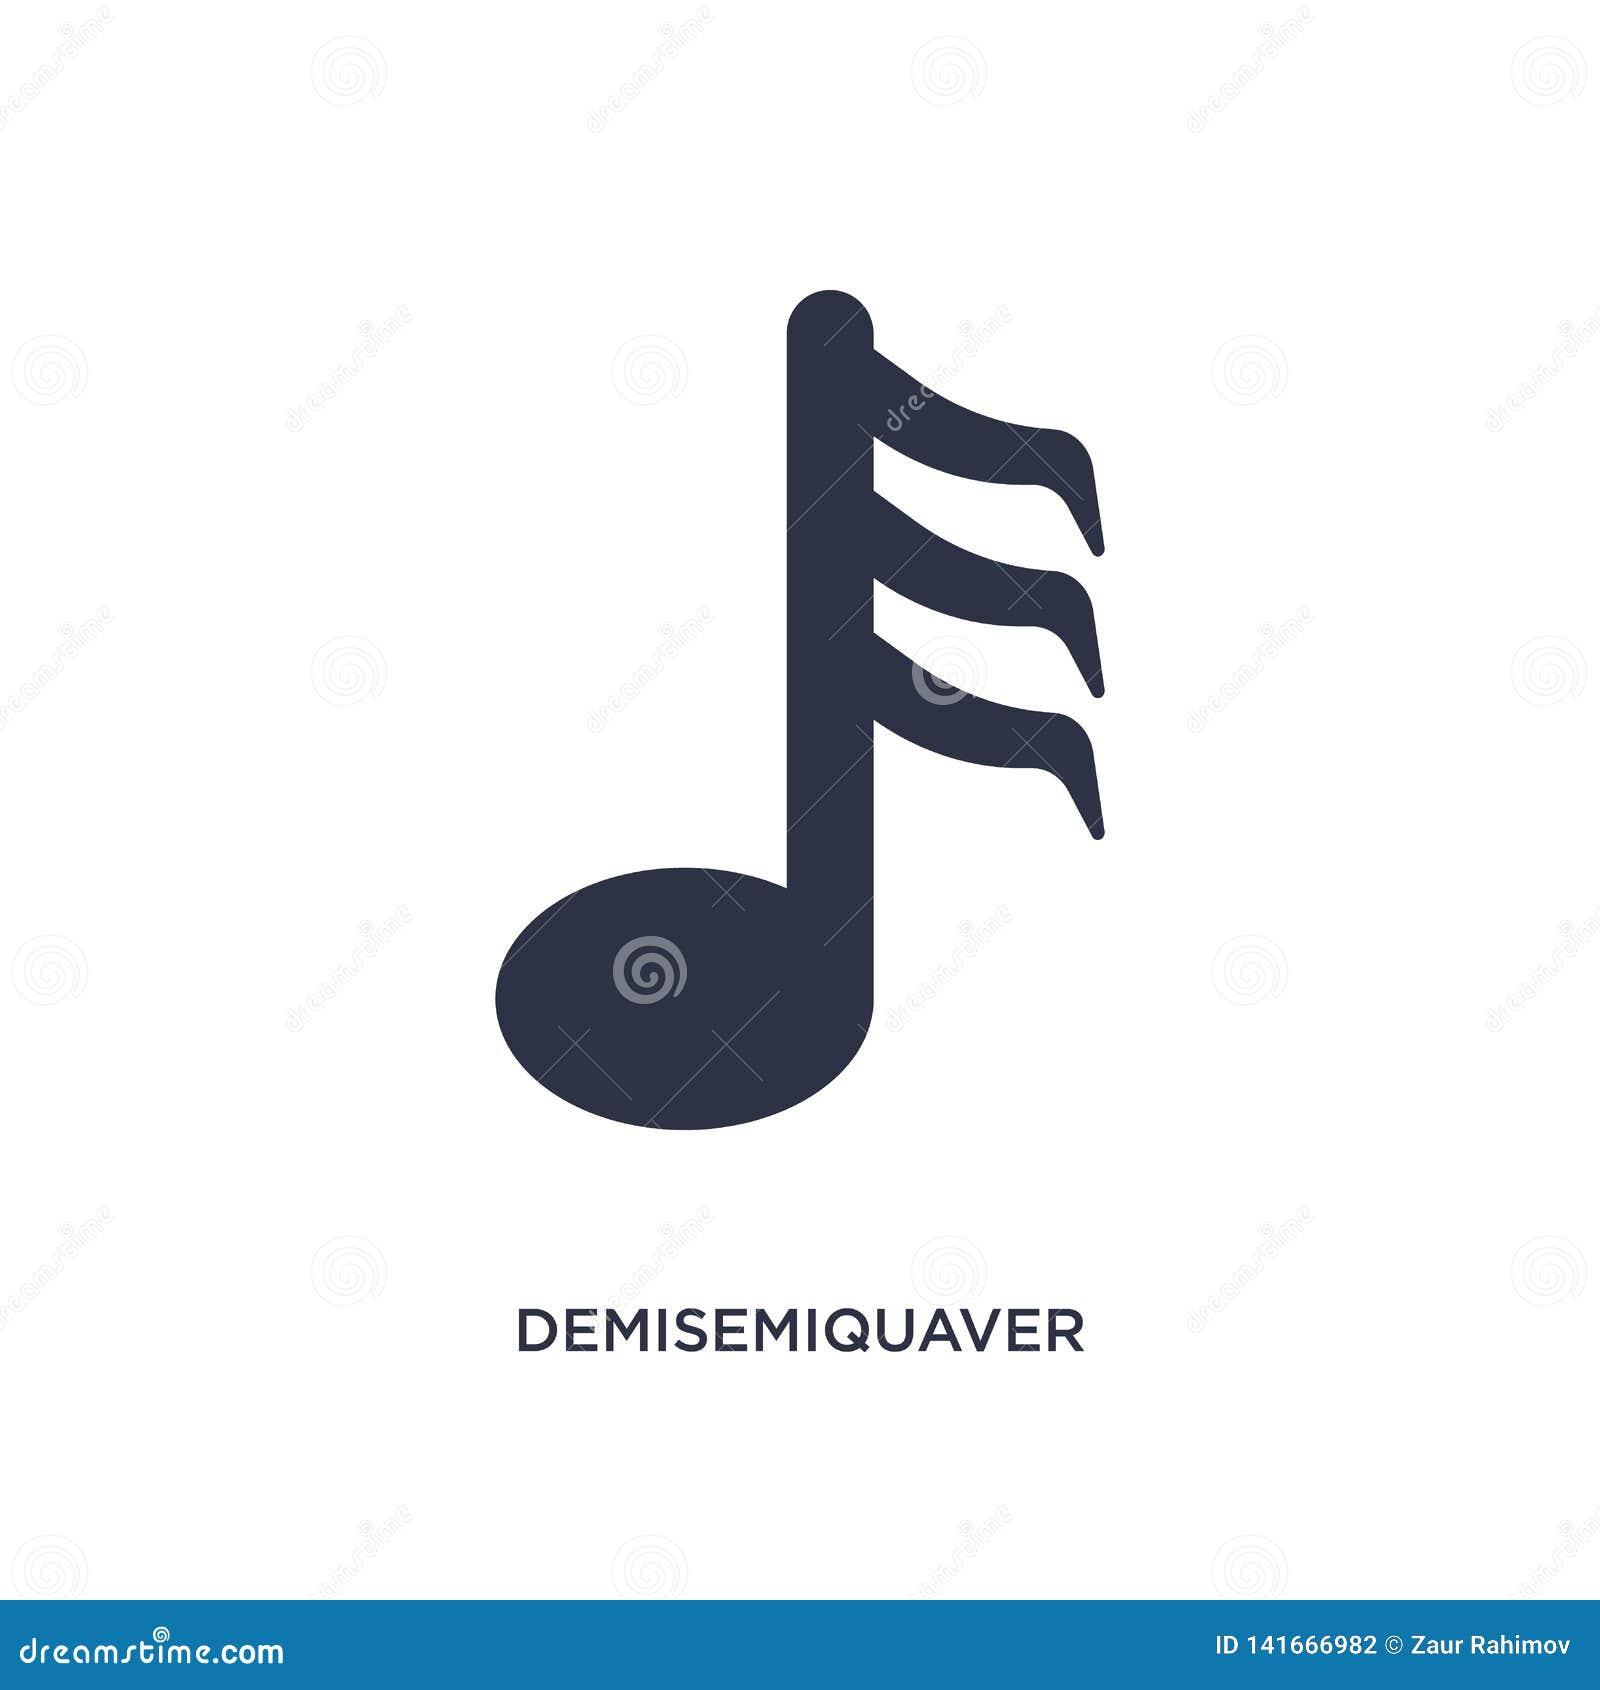 Demisemiquaver εικονίδιο στο άσπρο υπόβαθρο Απλή απεικόνιση στοιχείων από τη μουσική και την έννοια μέσων